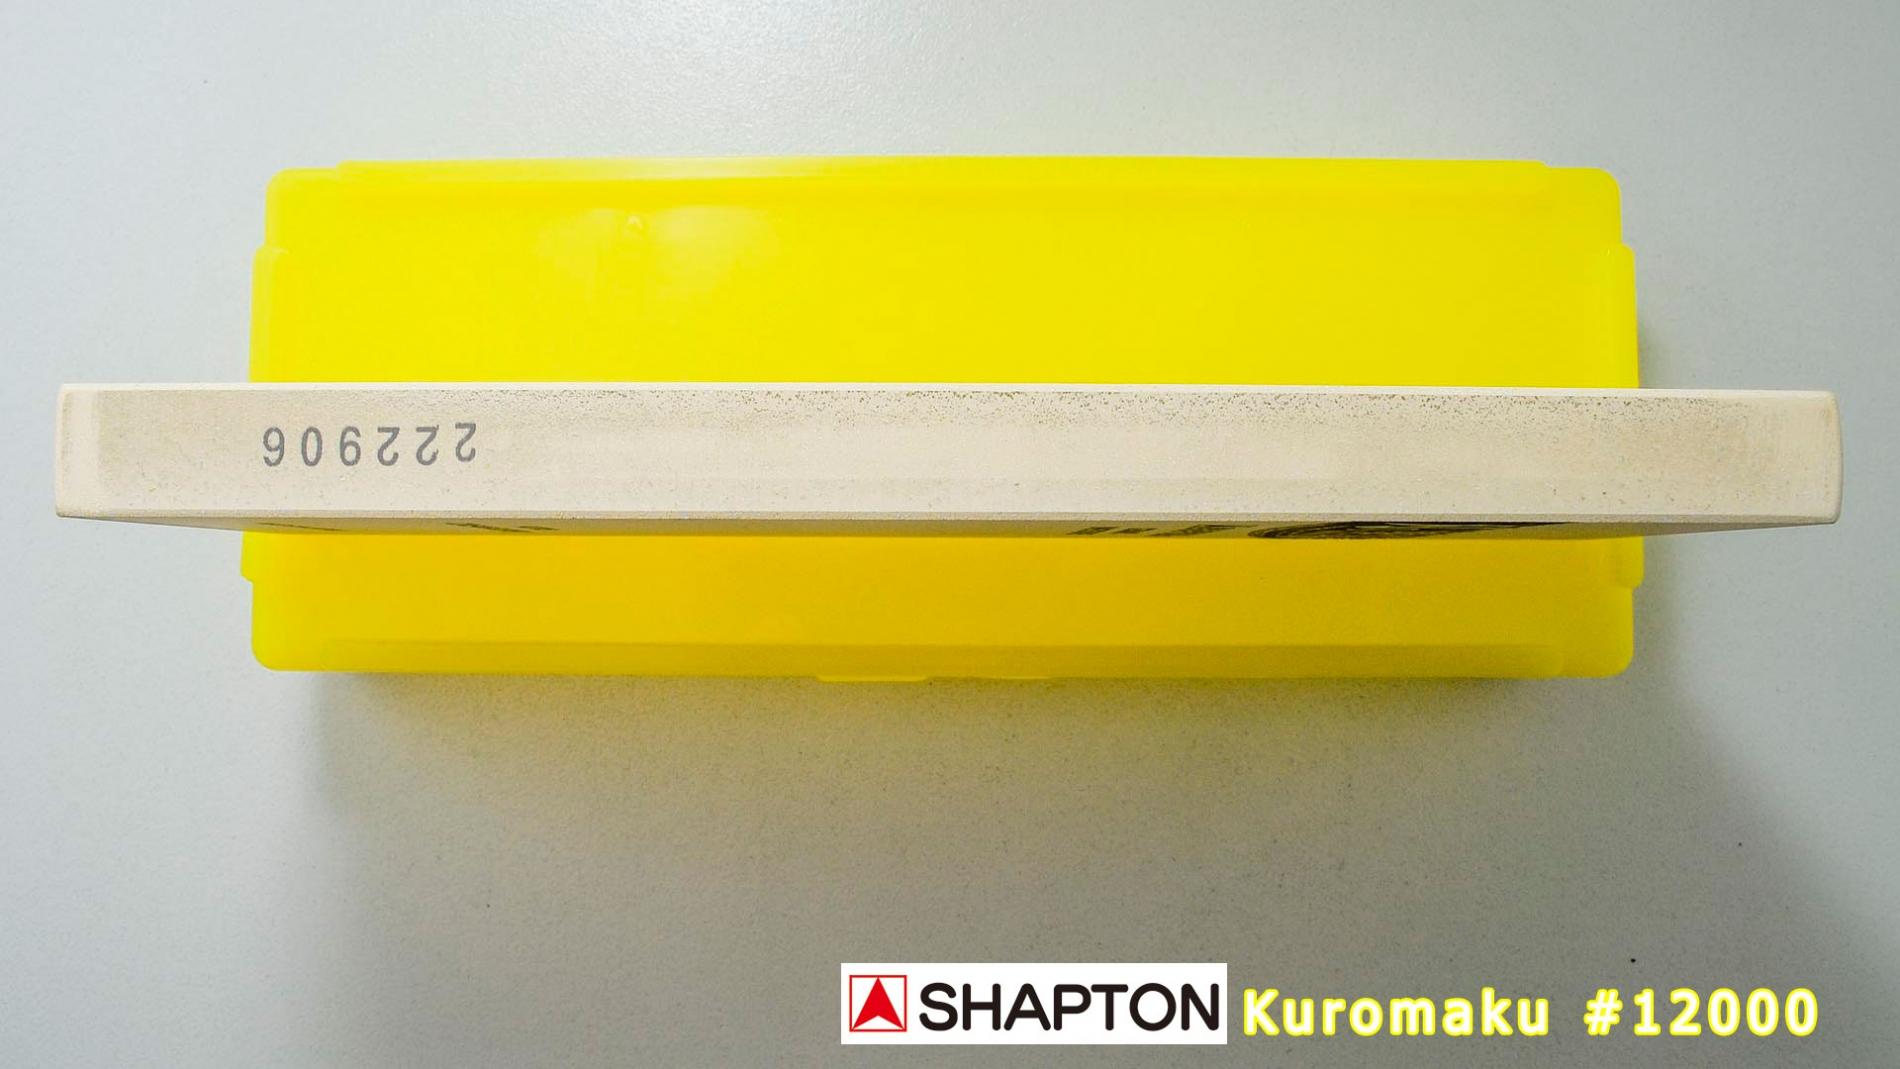 K0705-Piedra japonesa al agua asentar 12000 Shapton Kuromaku K0705-max-5.